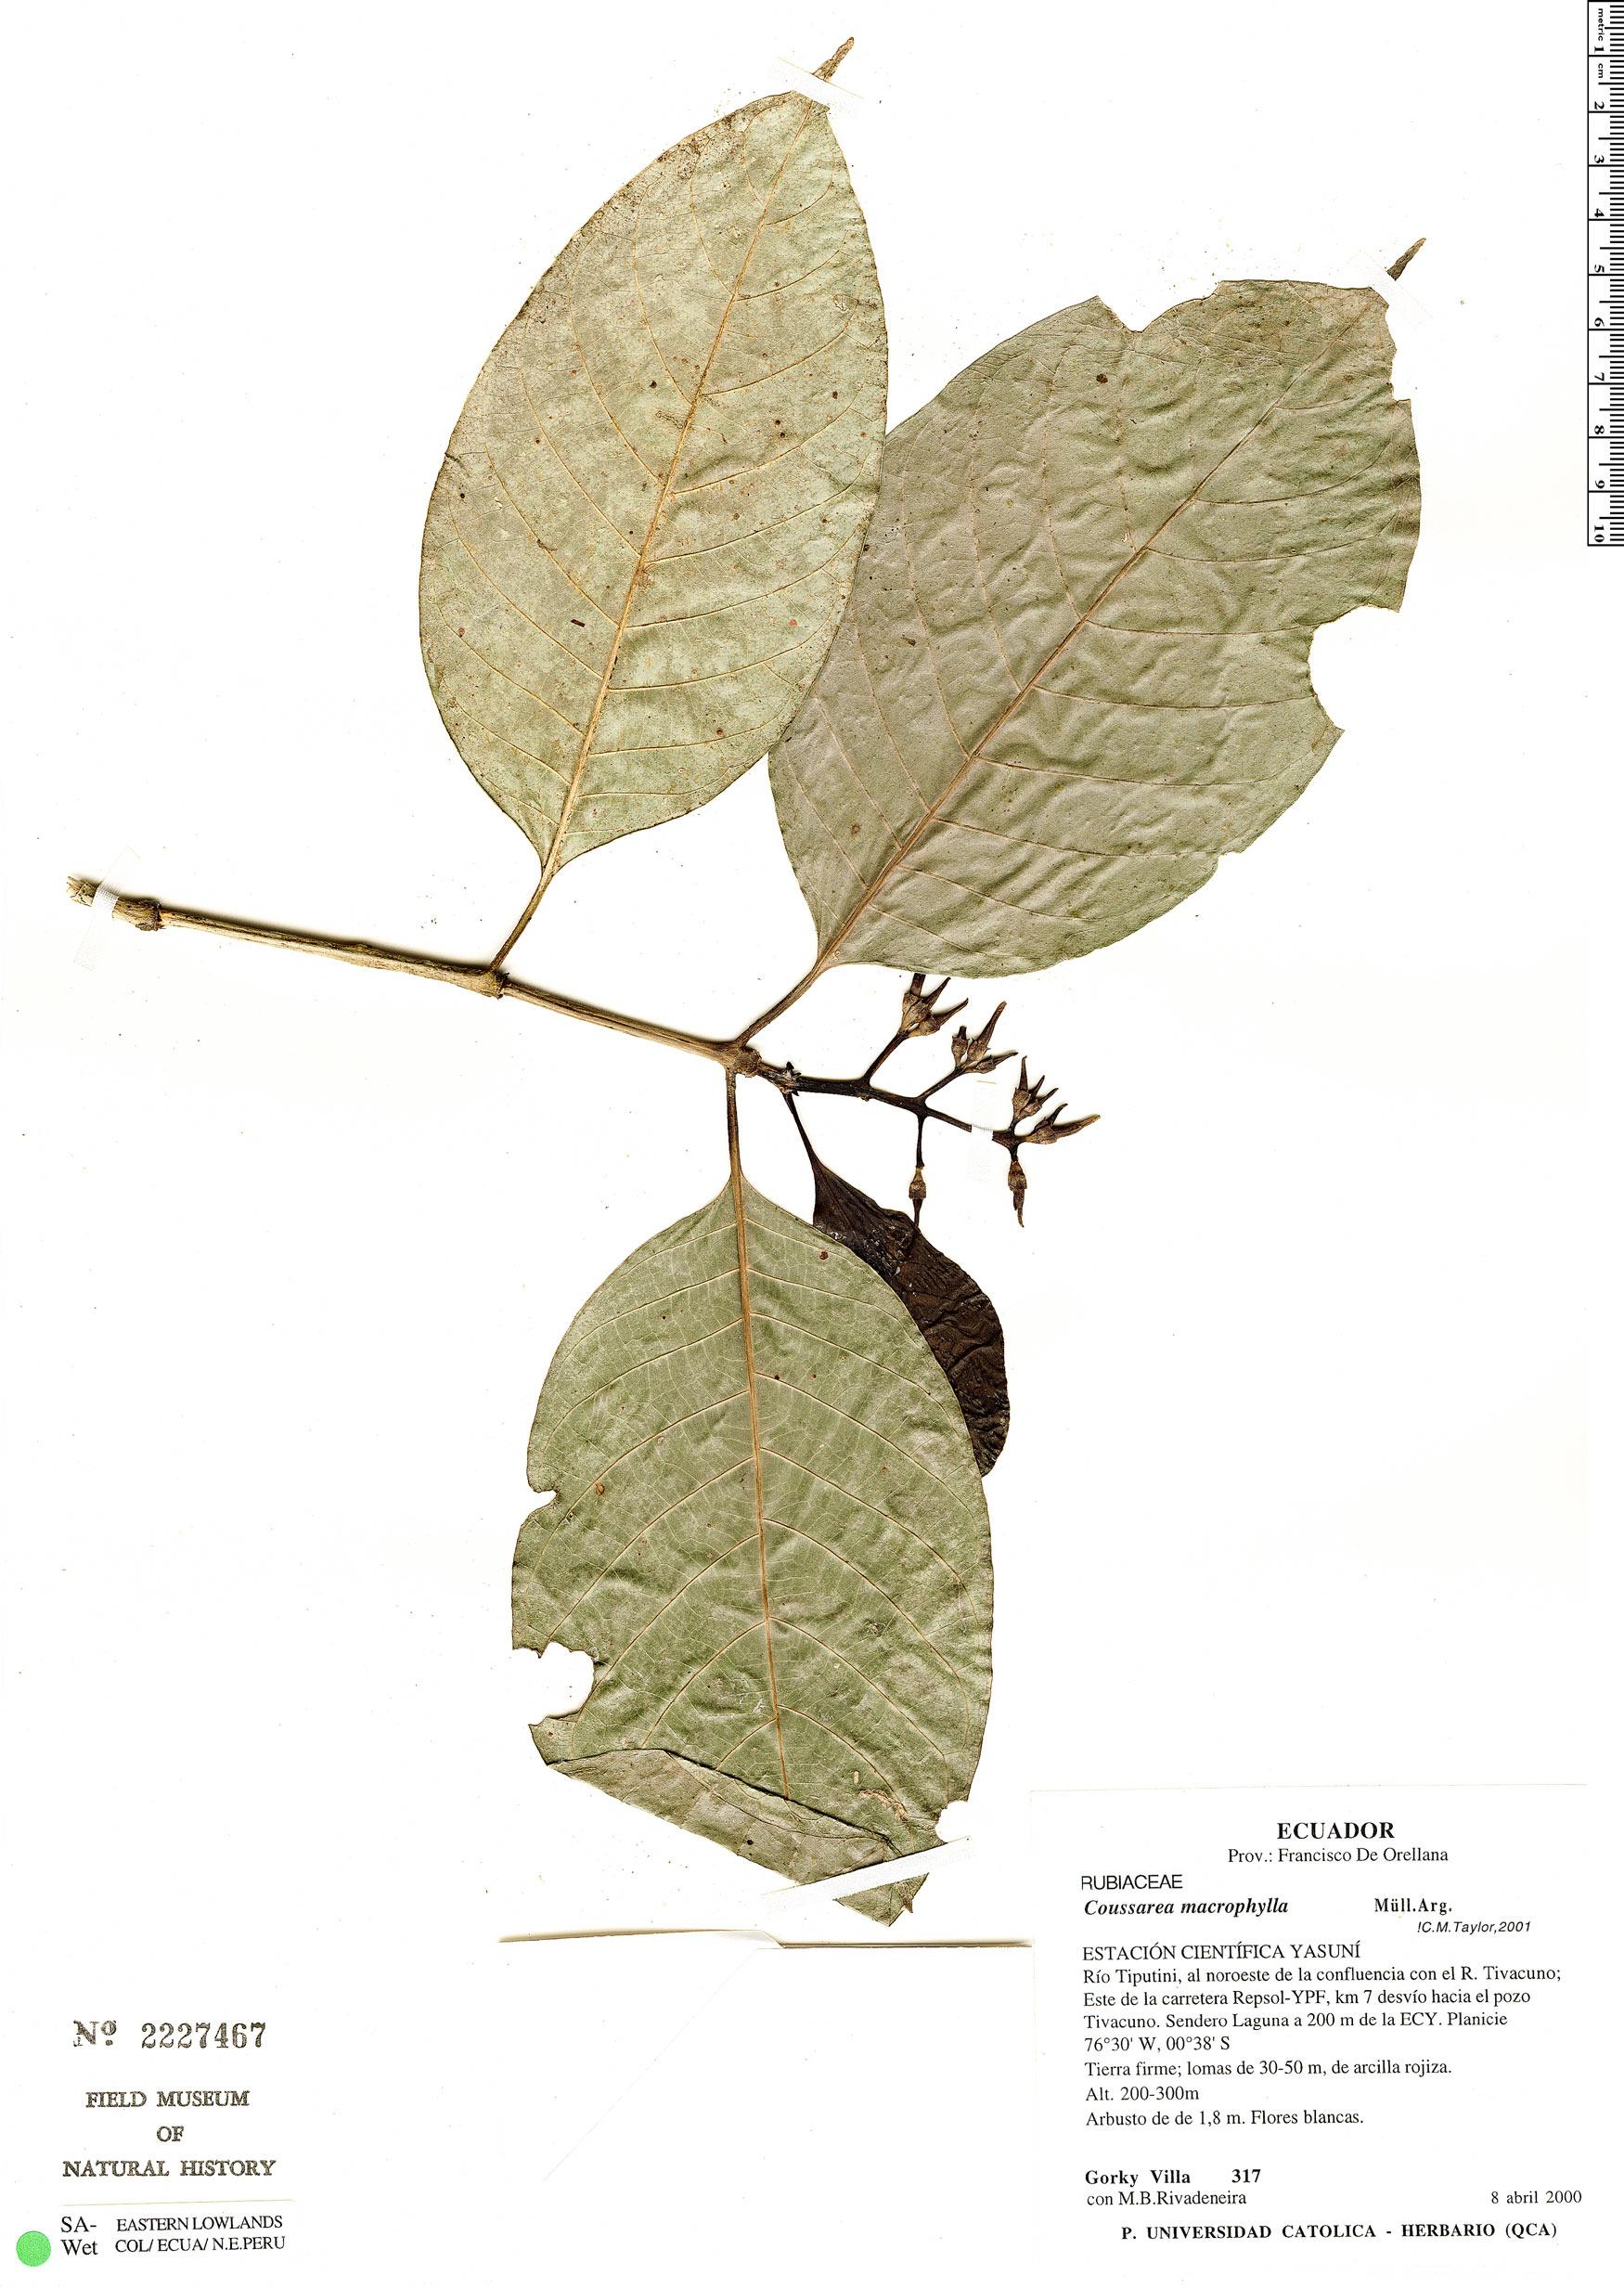 Specimen: Coussarea macrophylla